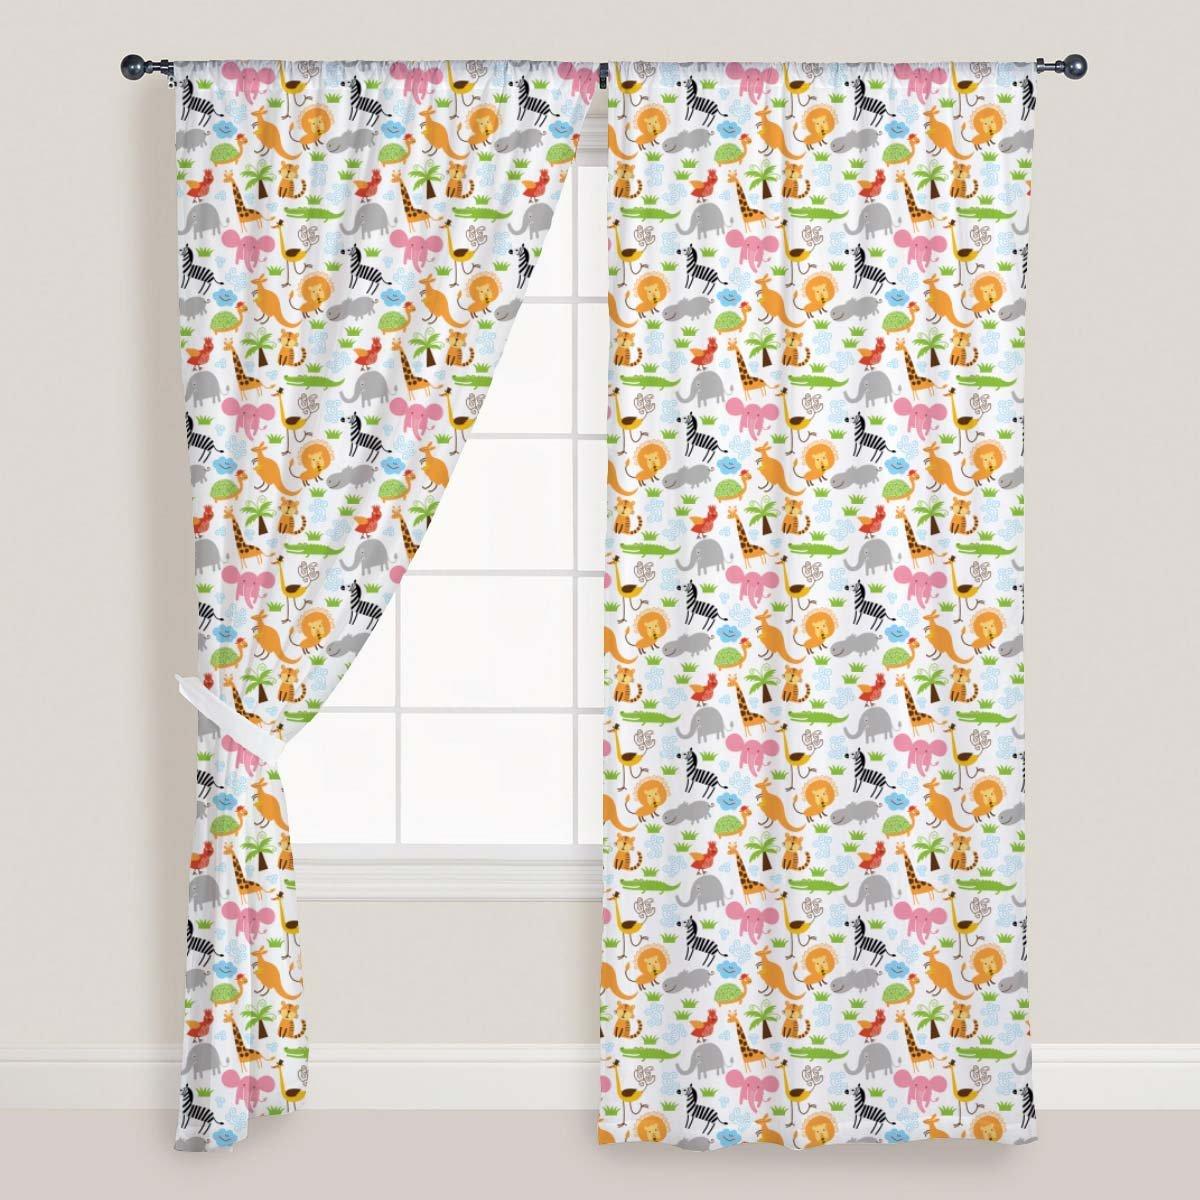 AZ Cute Animals Door & Window Curtain Satin 4feet x 8feet; SET OF 2 PCS